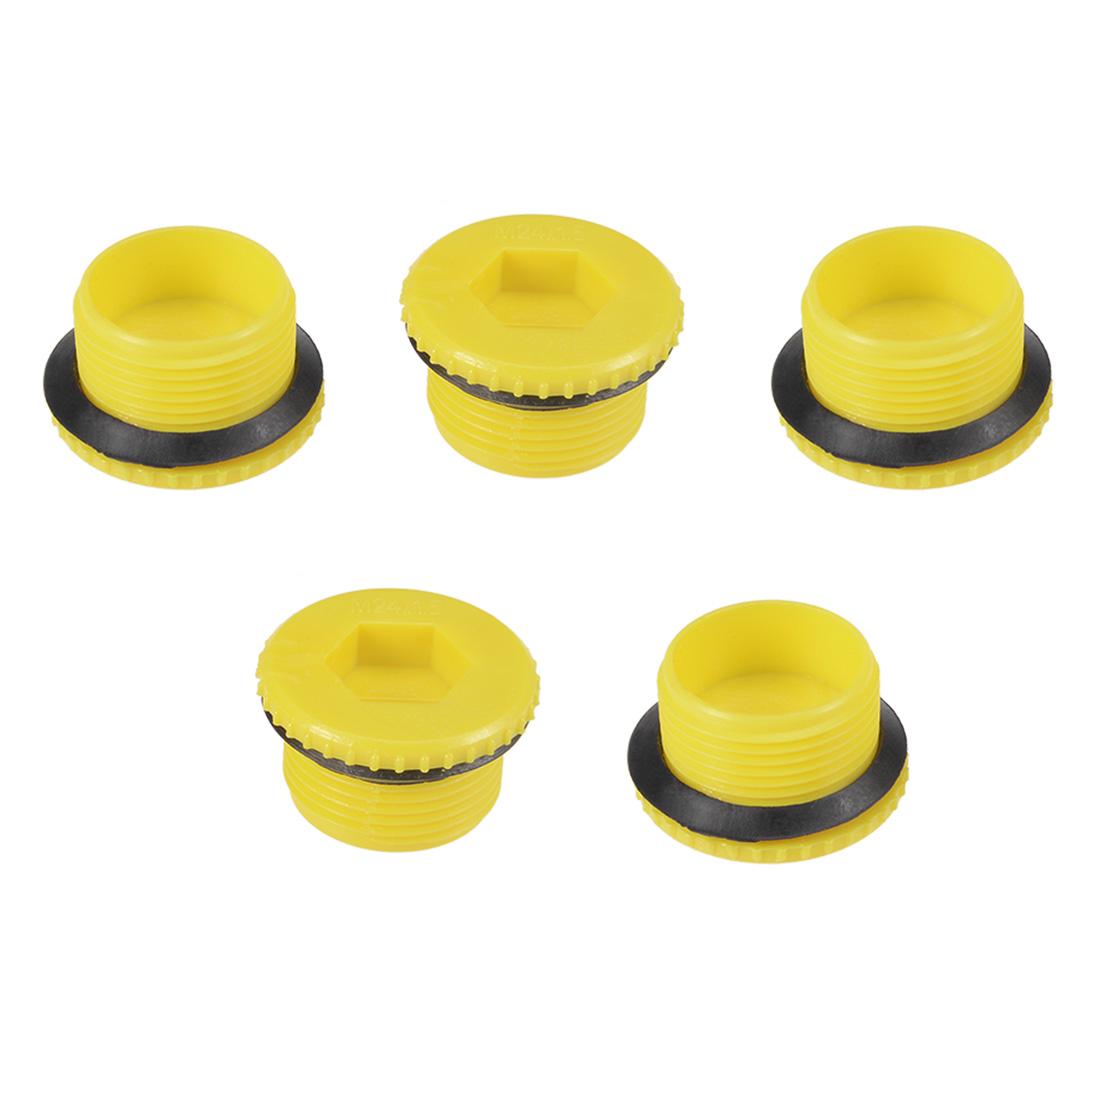 MLD-M24 M24 Hex Socket Design PE Plastic Male Threaded Sealing Cap Yellow 5pcs